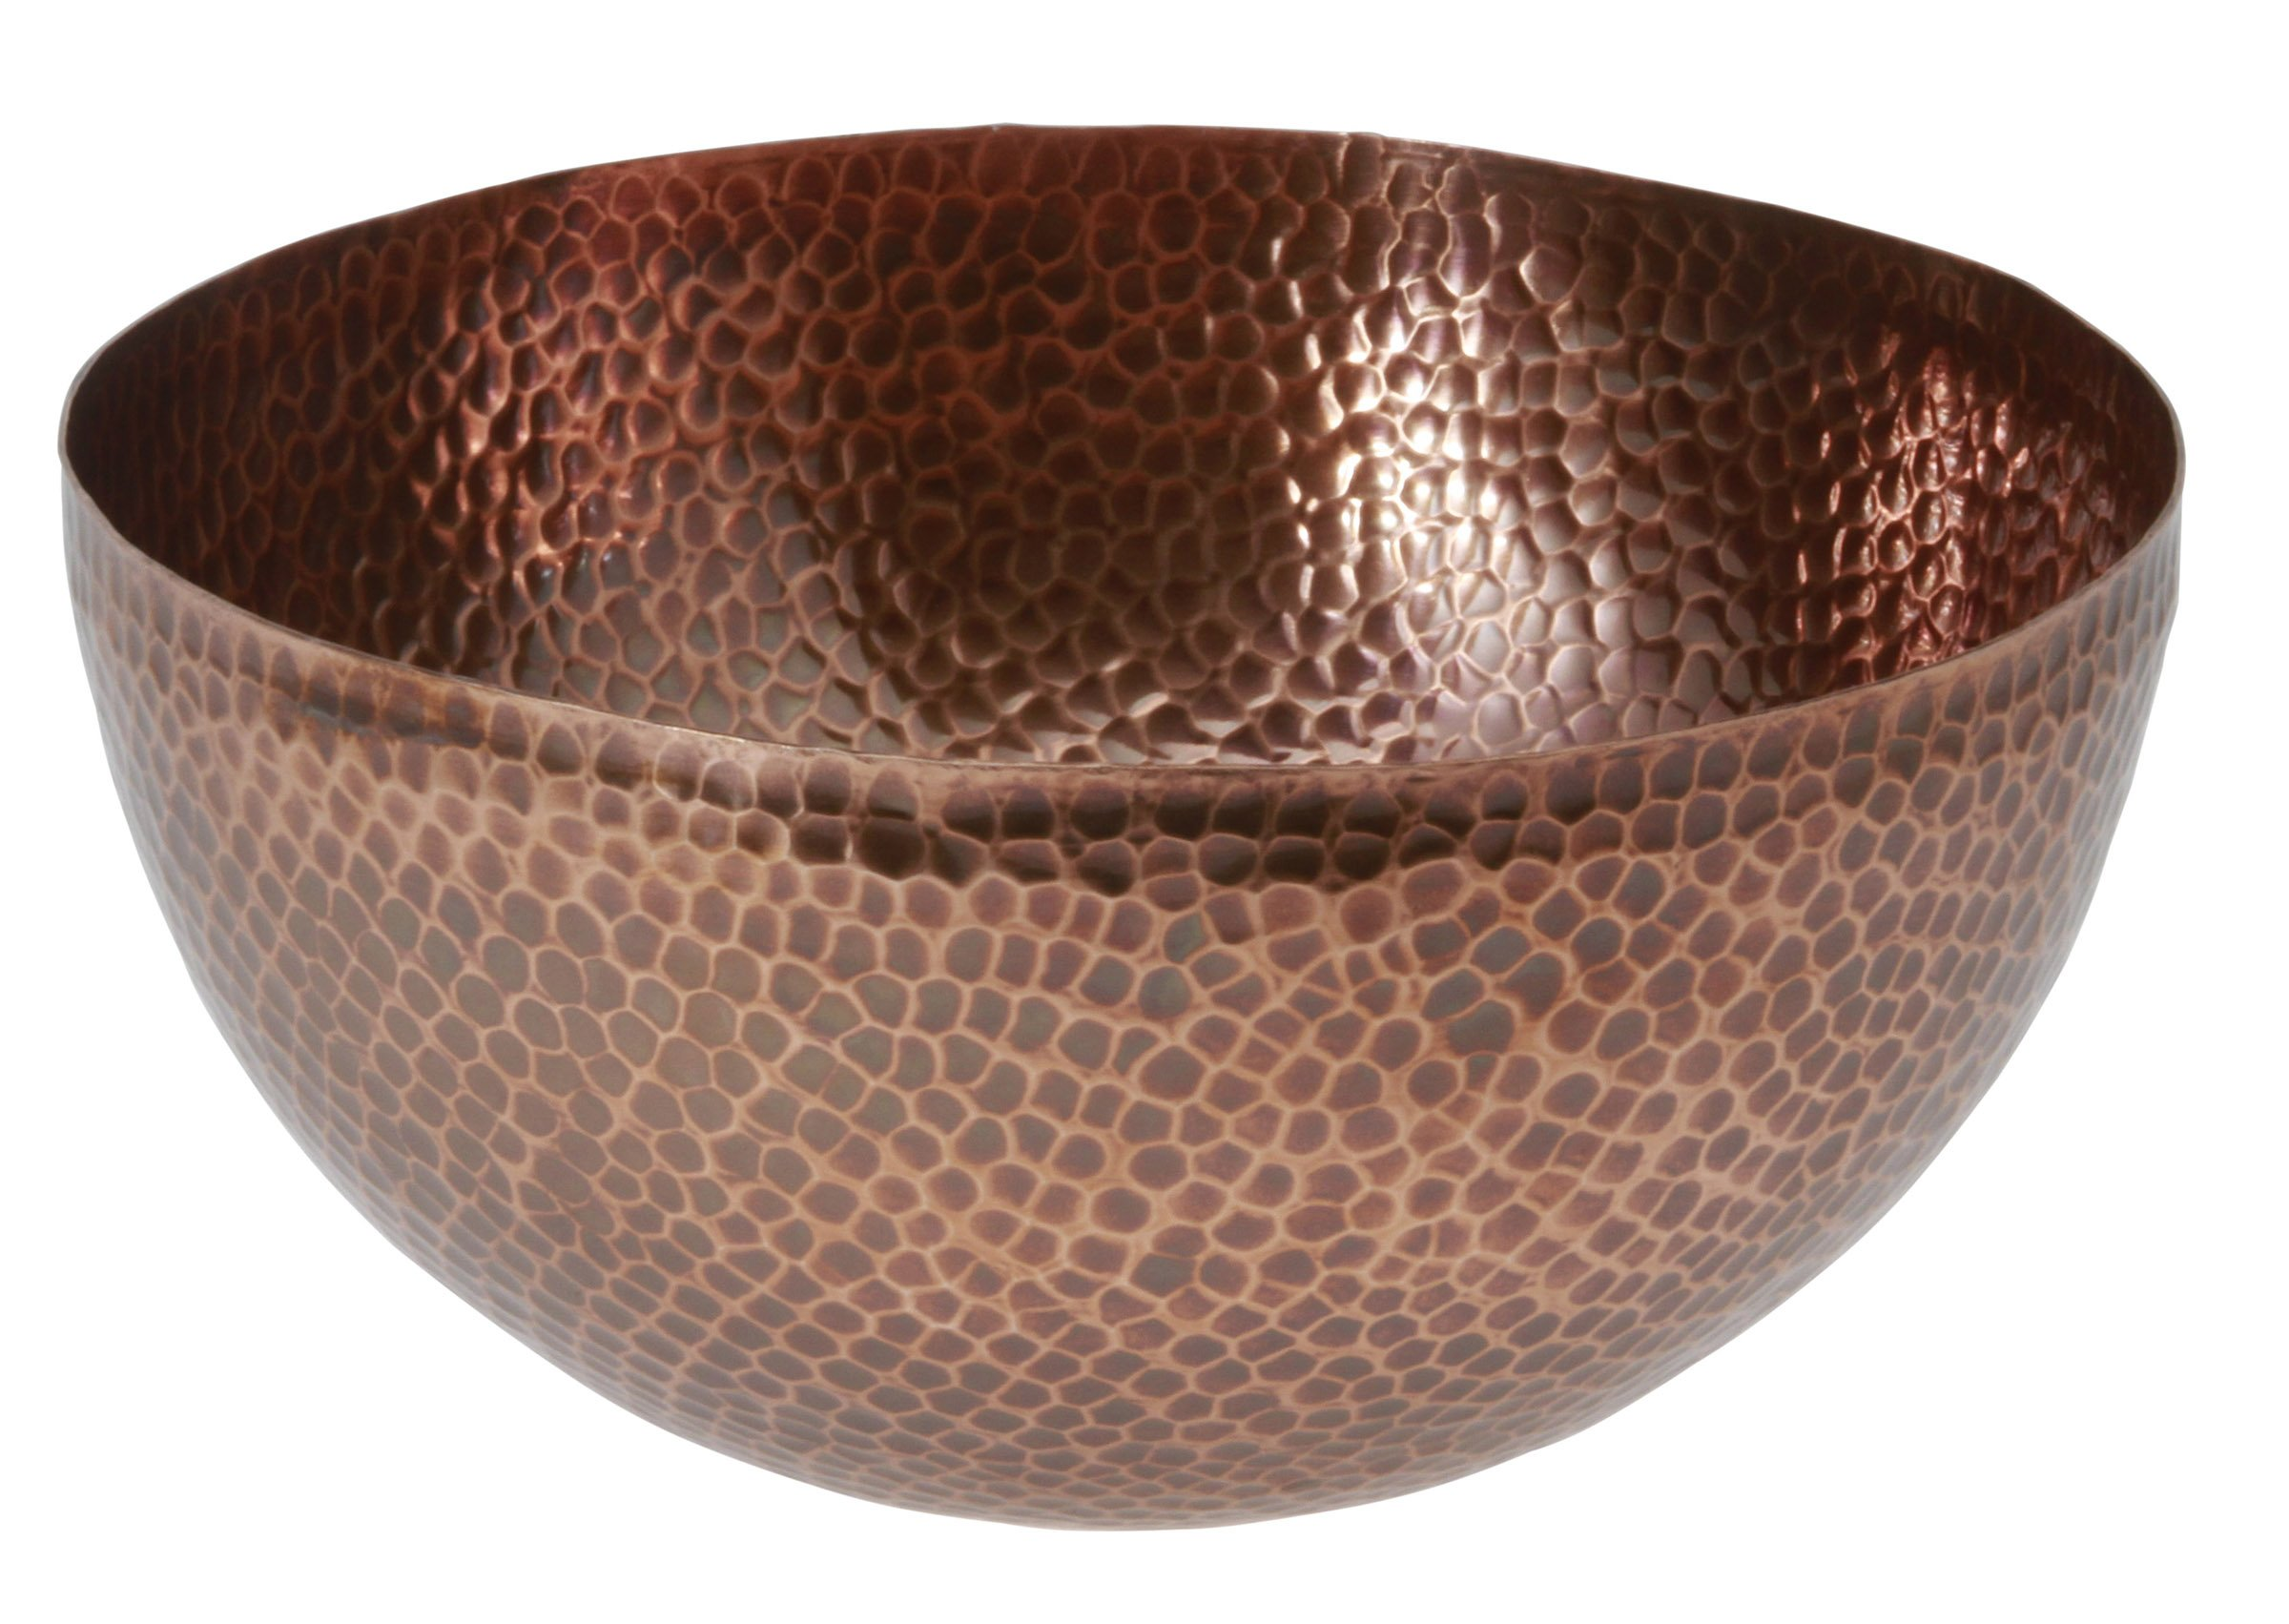 Thirstystone Urban Farm Medium Round Hammered Antique Bowl, Copper